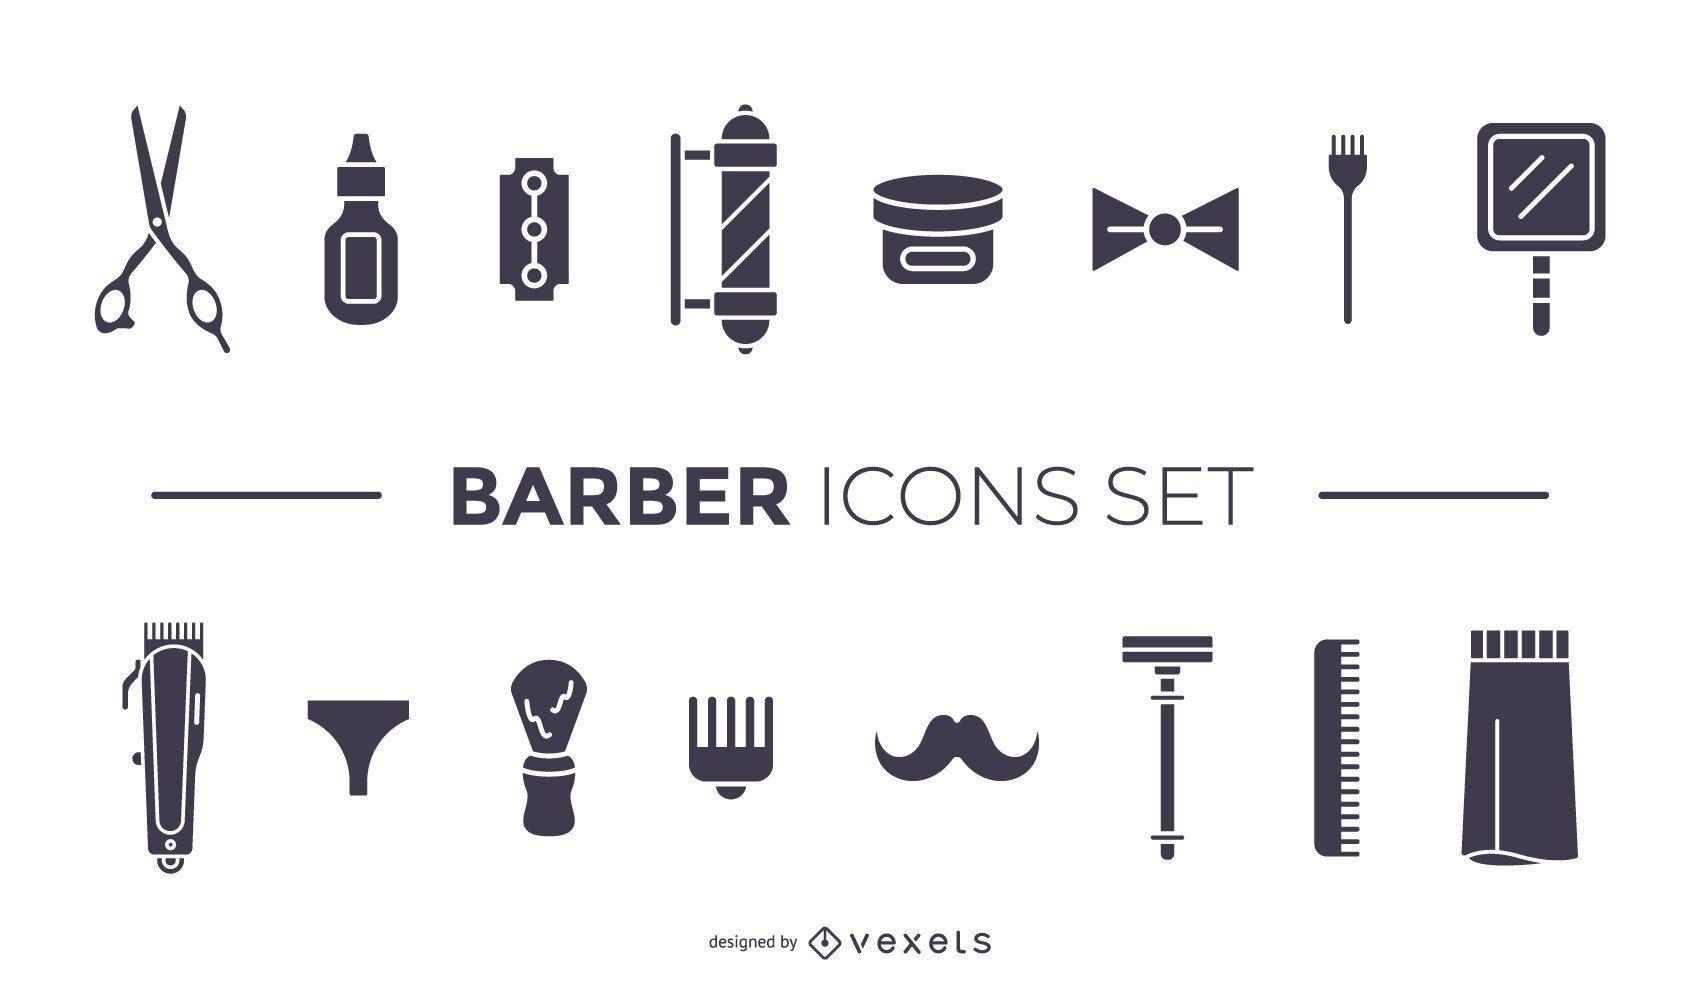 barber elements black icon set